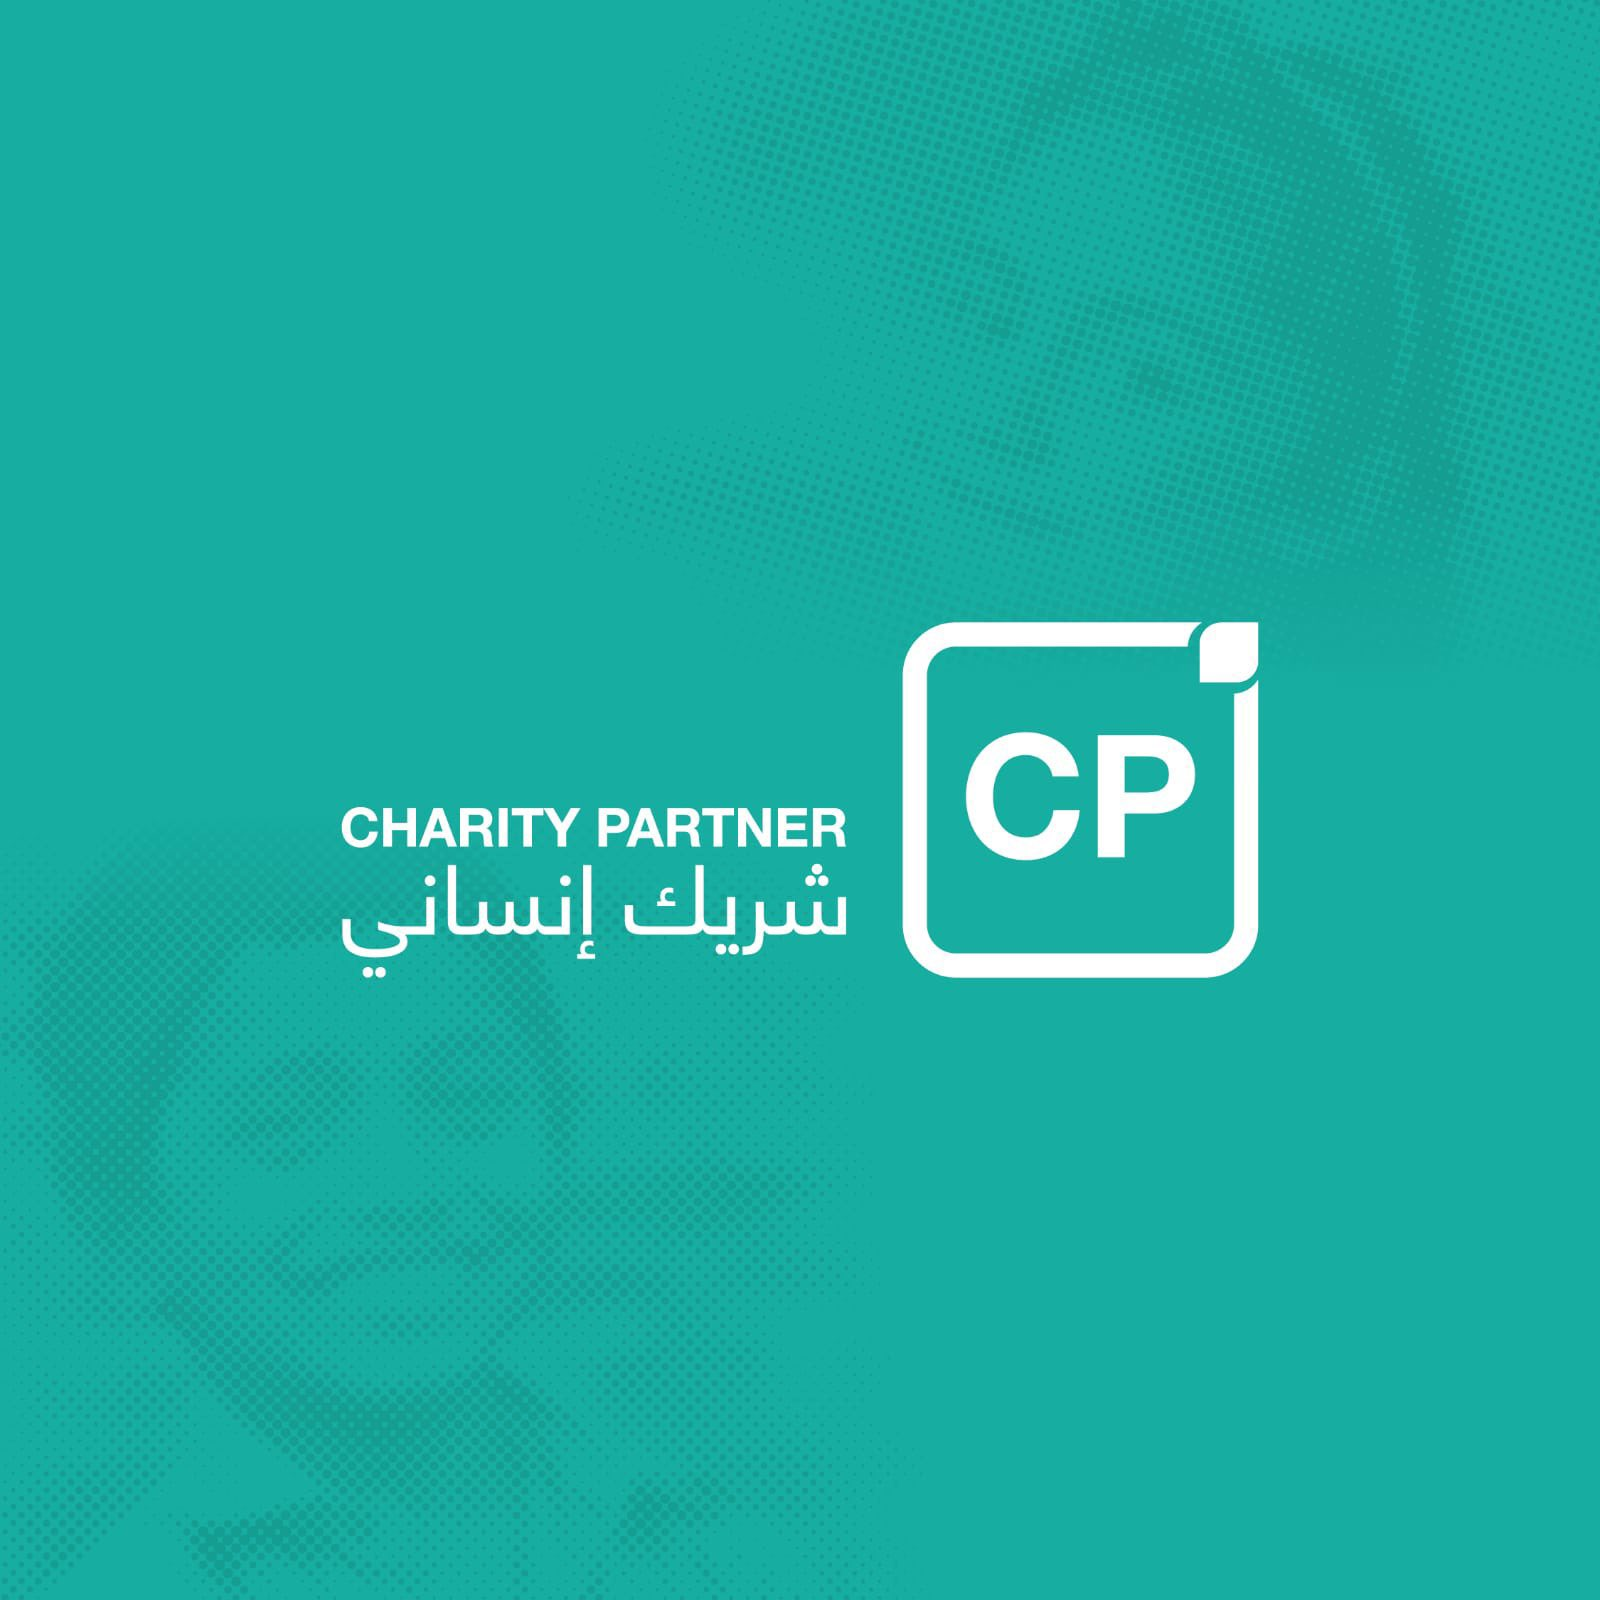 Qatar Charity Launches CP Humanitarian Branding Program